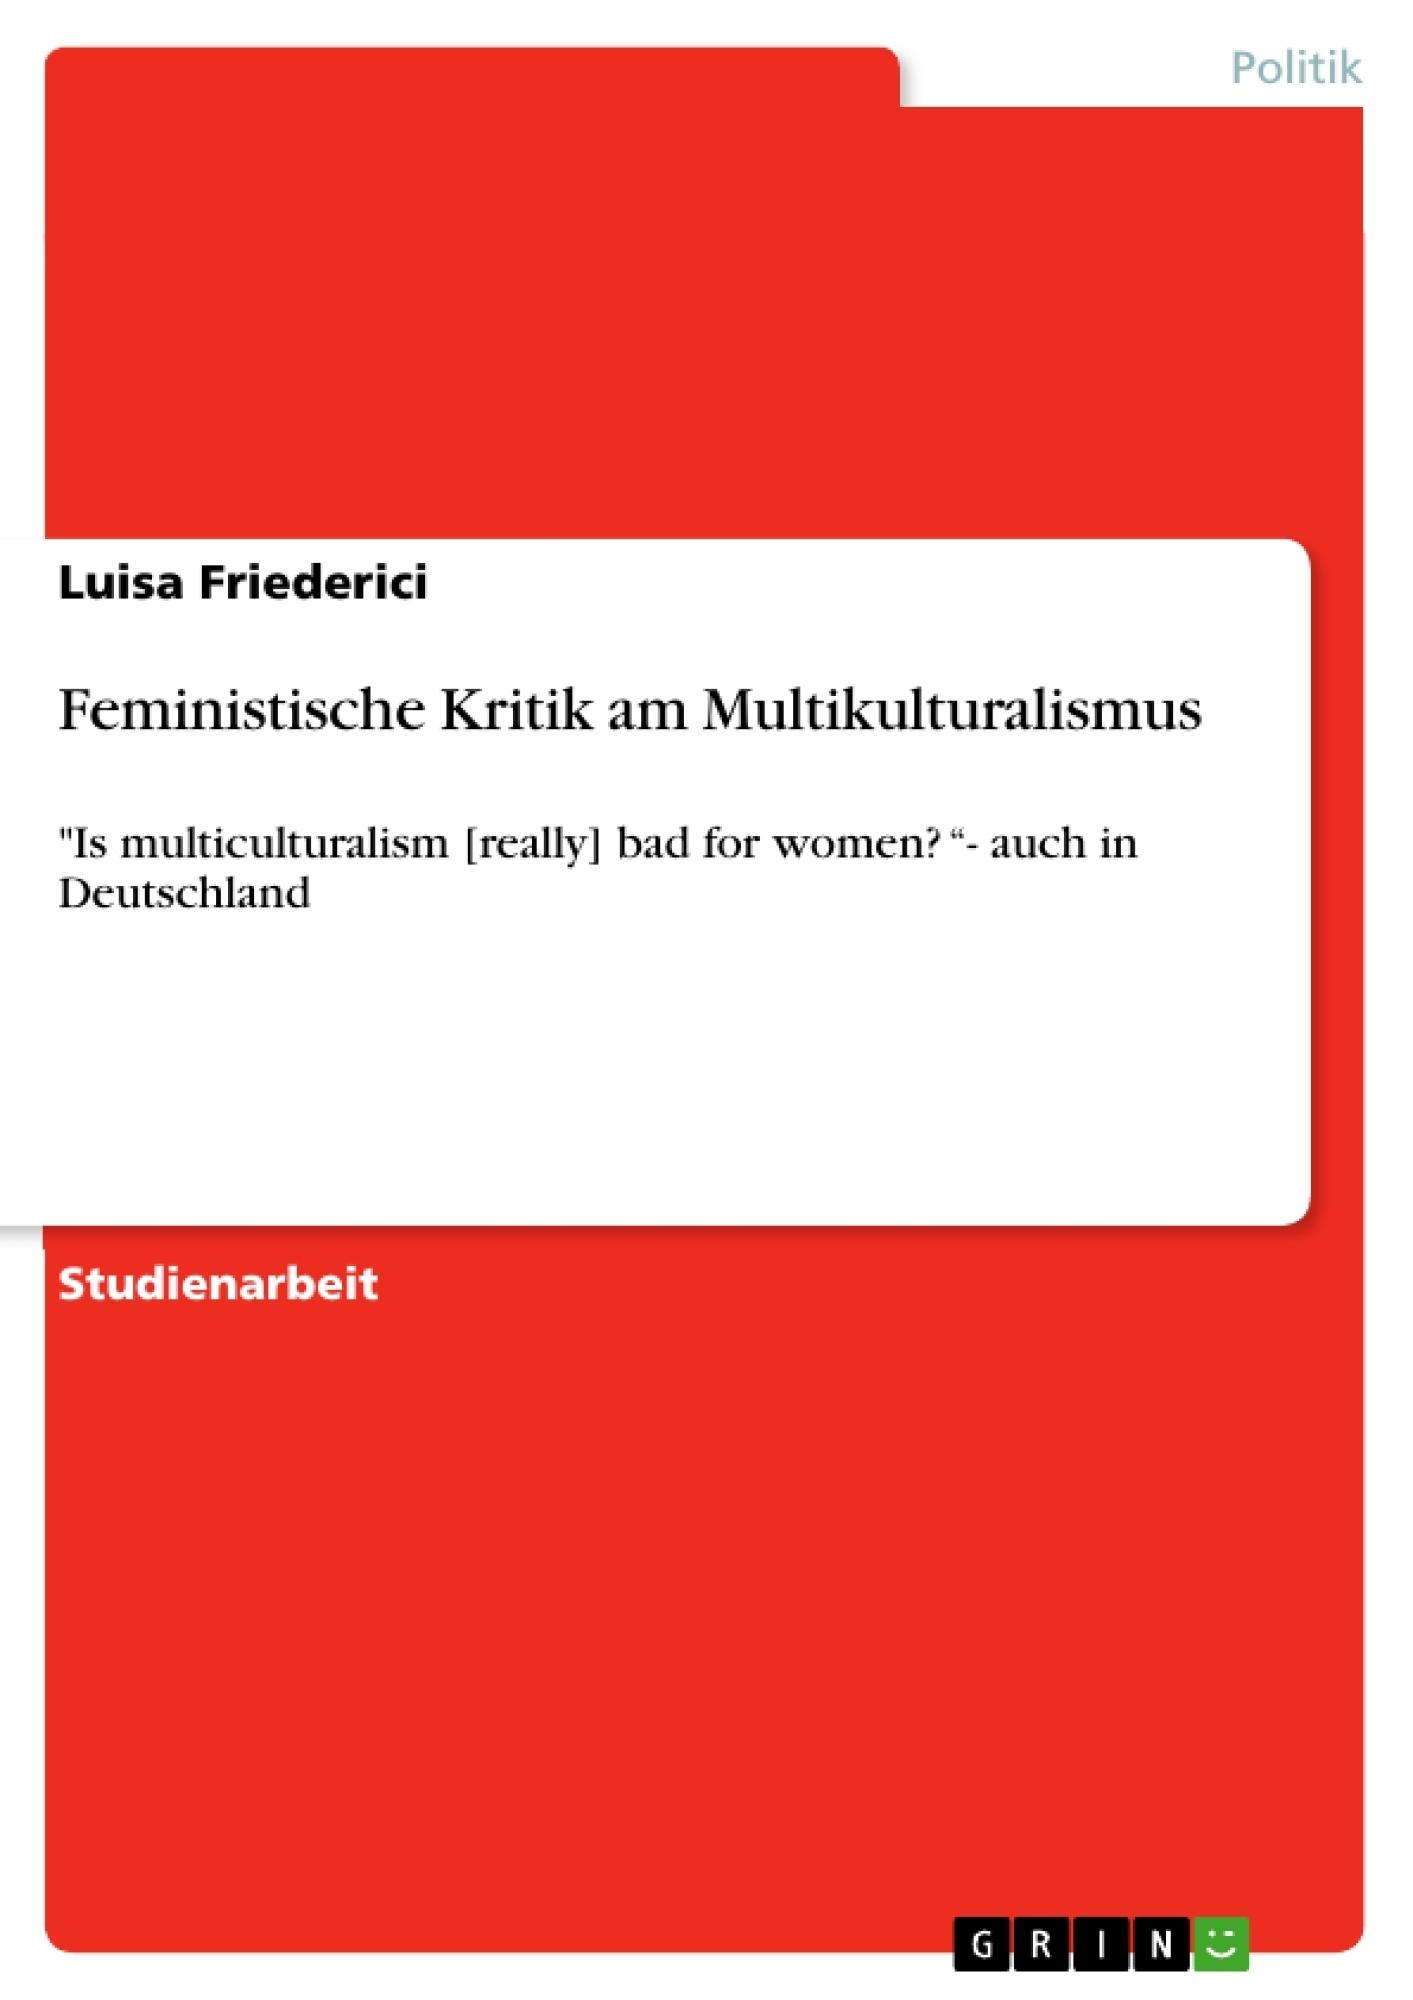 Titel: Feministische Kritik am Multikulturalismus